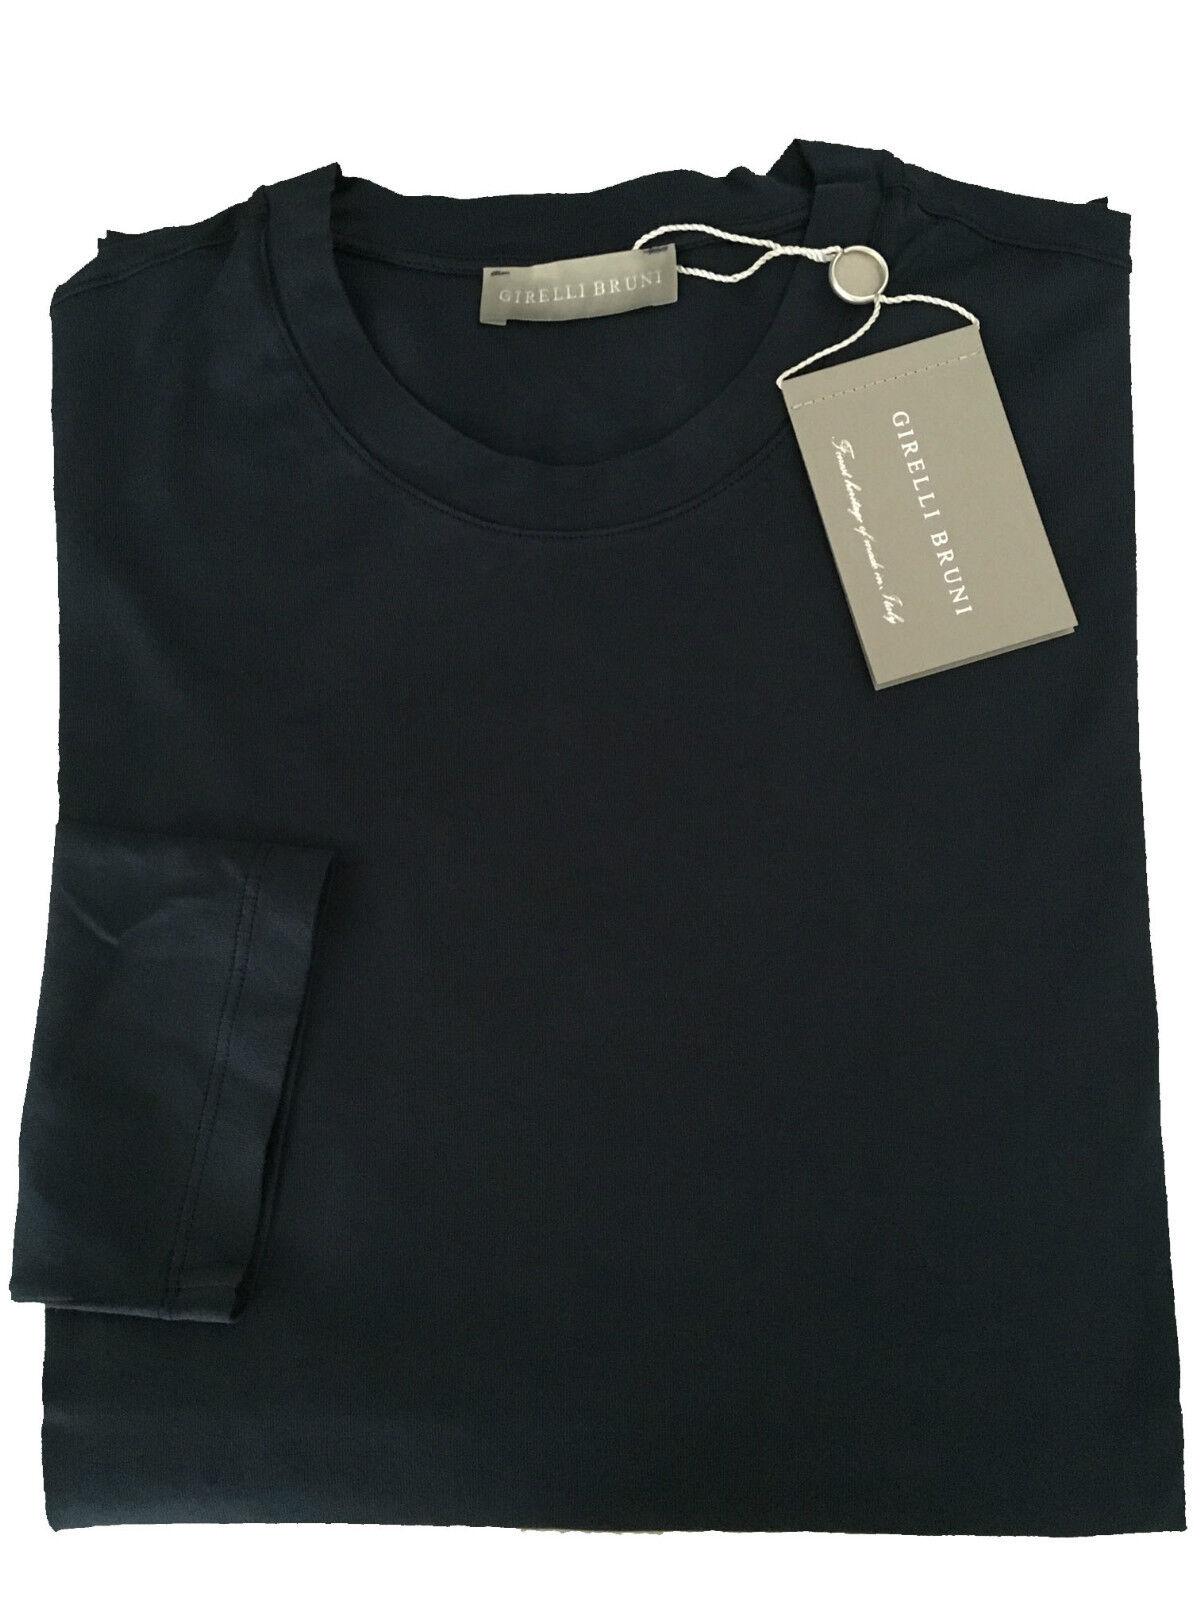 GIRELLI BRUNI t-shirt   IN manica lunga nero 100% cotone GIZA 60 MADE IN  ITA 181416